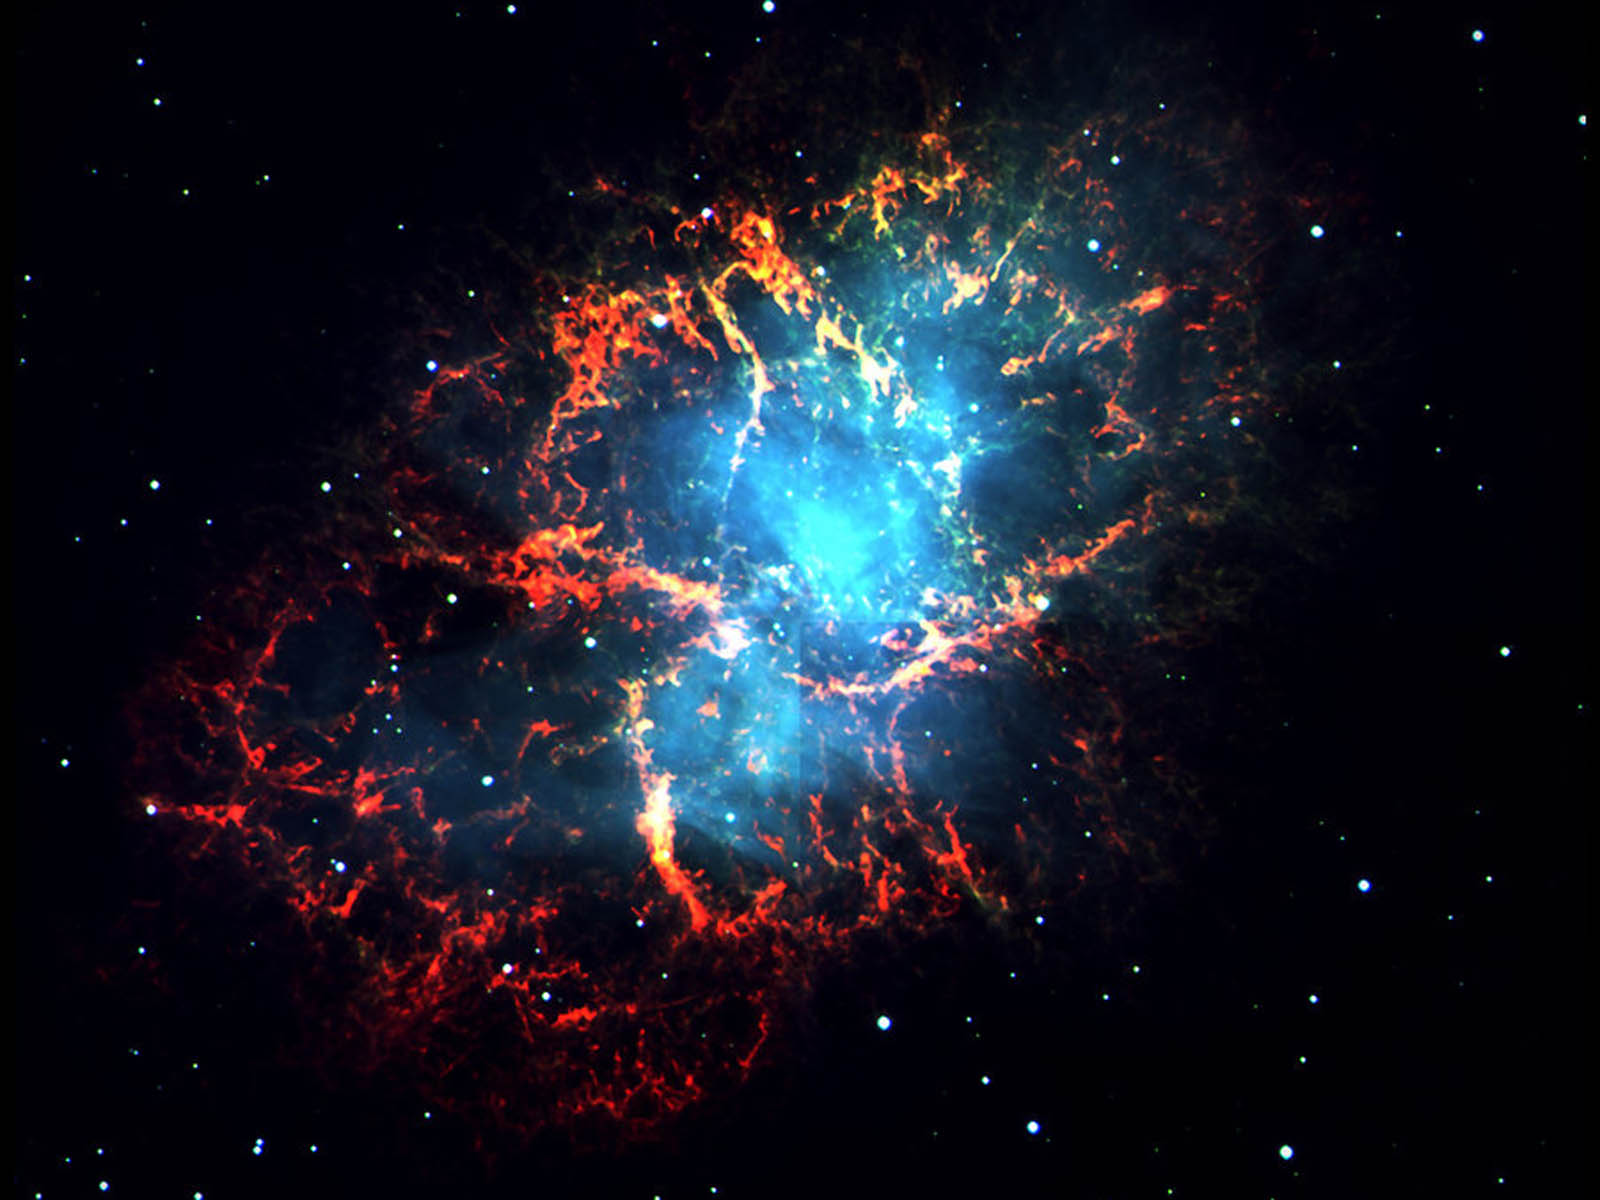 Crab Nebula Wallpaper images 1600x1200